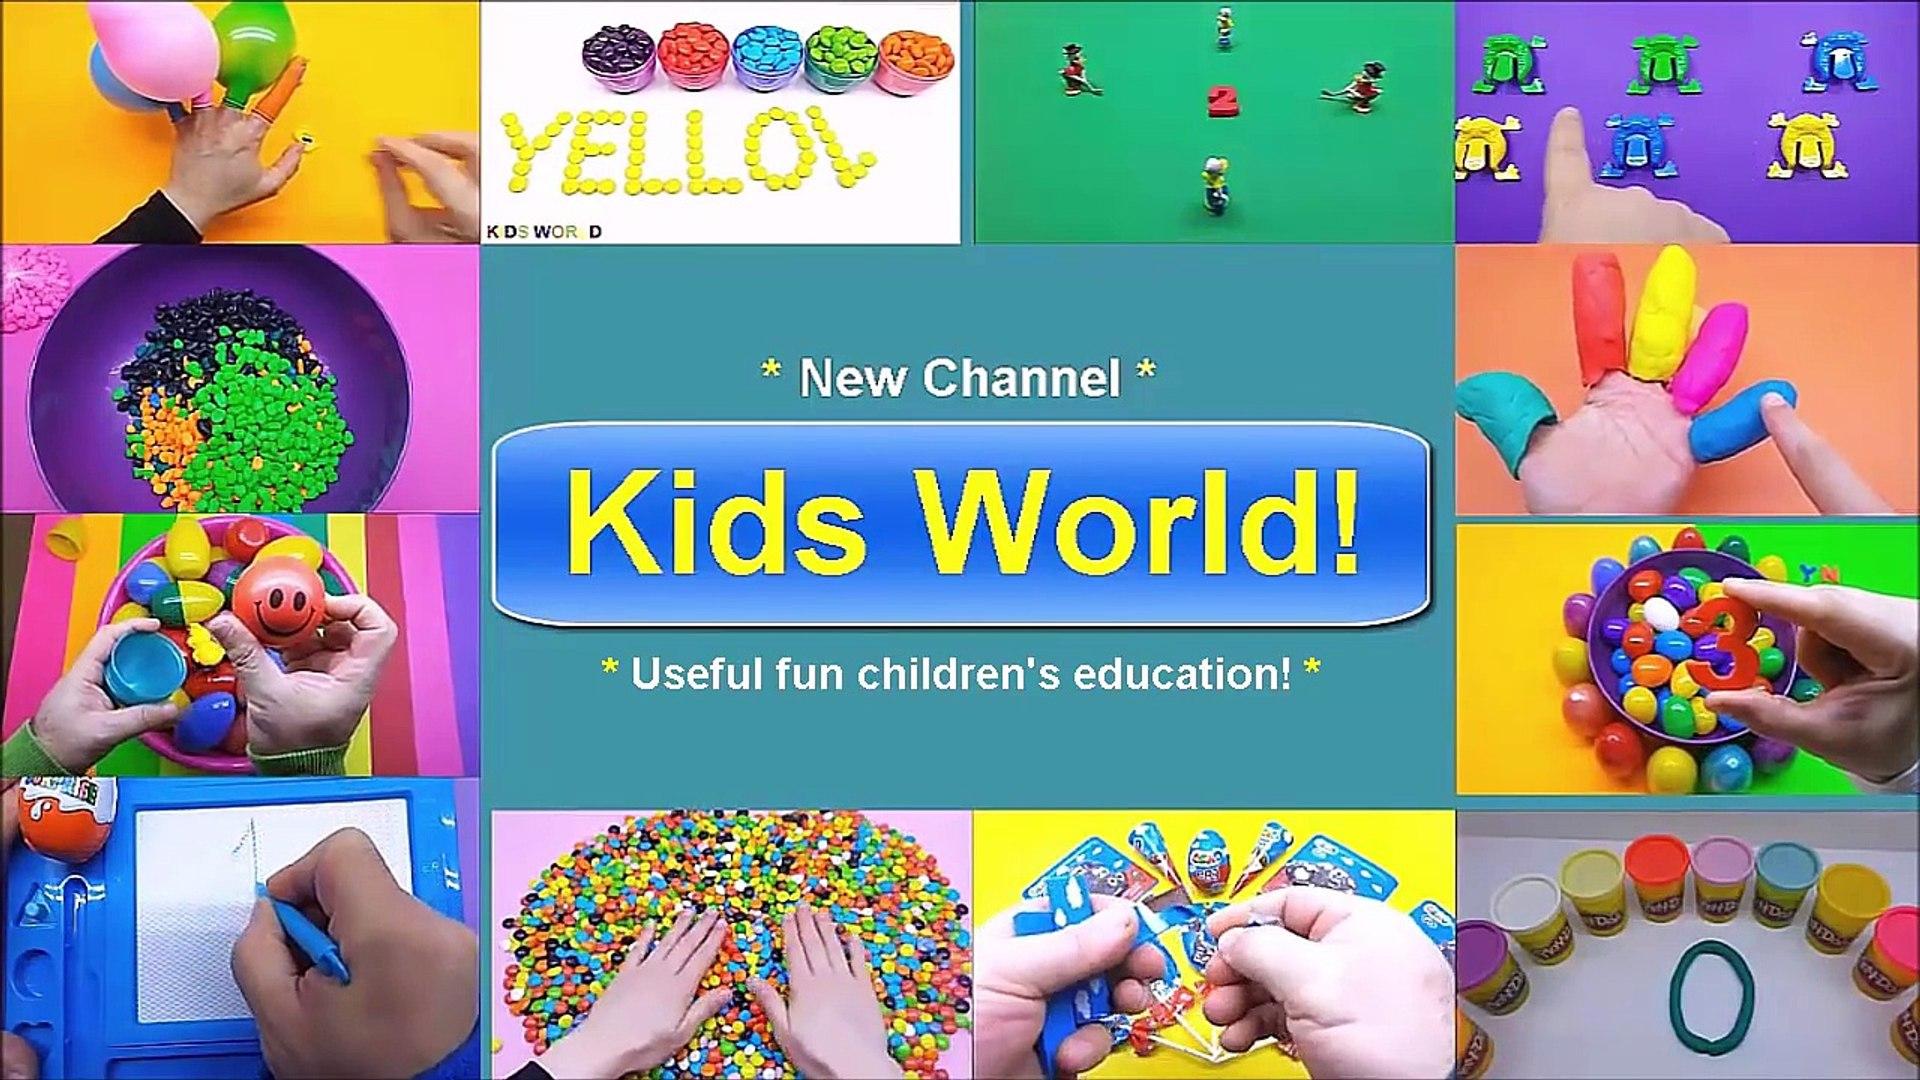 Preschool education for children! Useful fun educational for kids! Kids World!